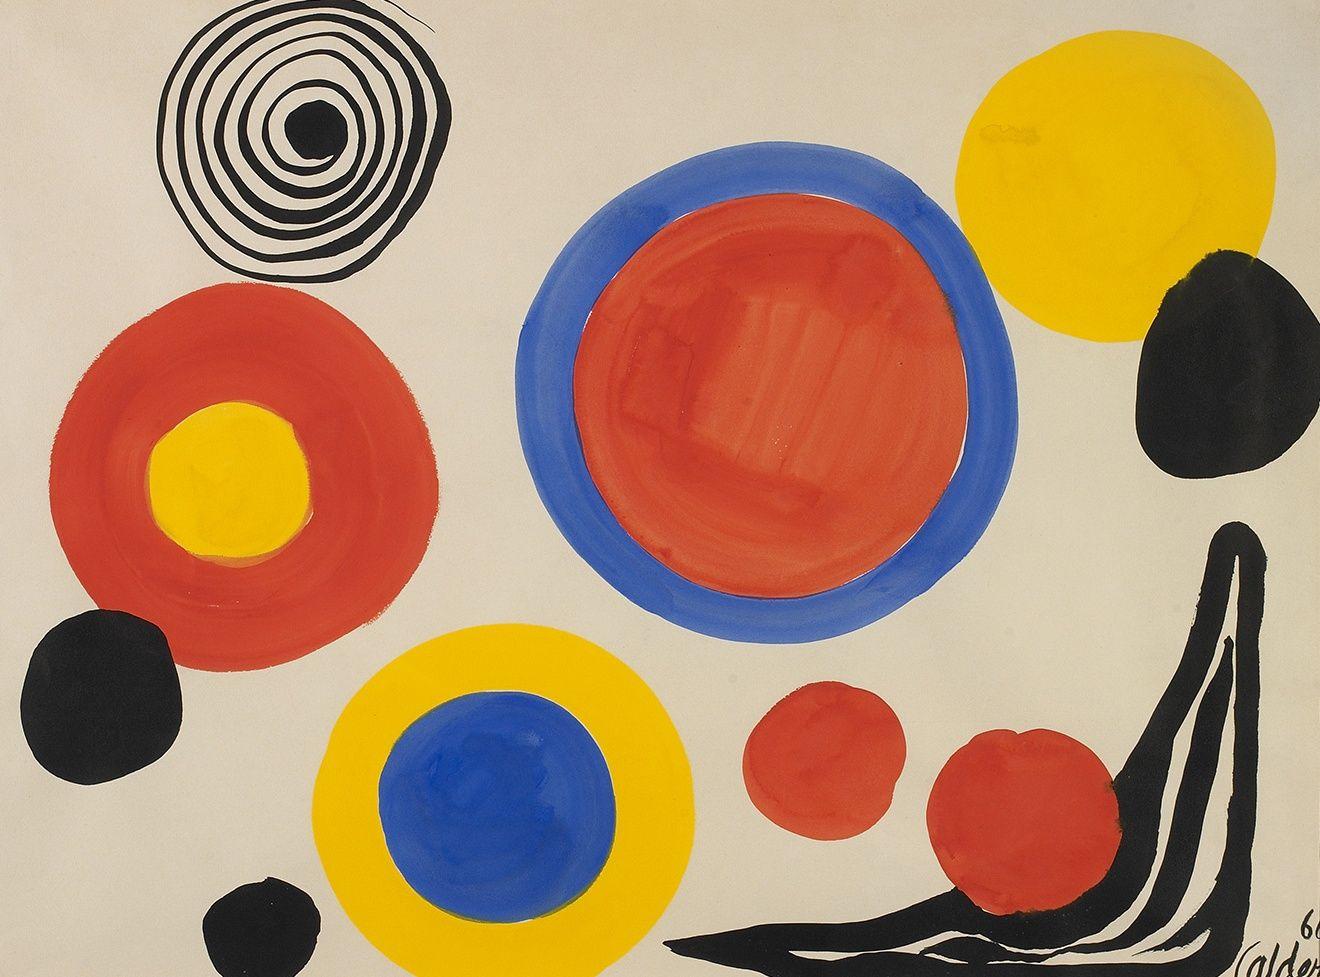 Alexander Calder - Circles